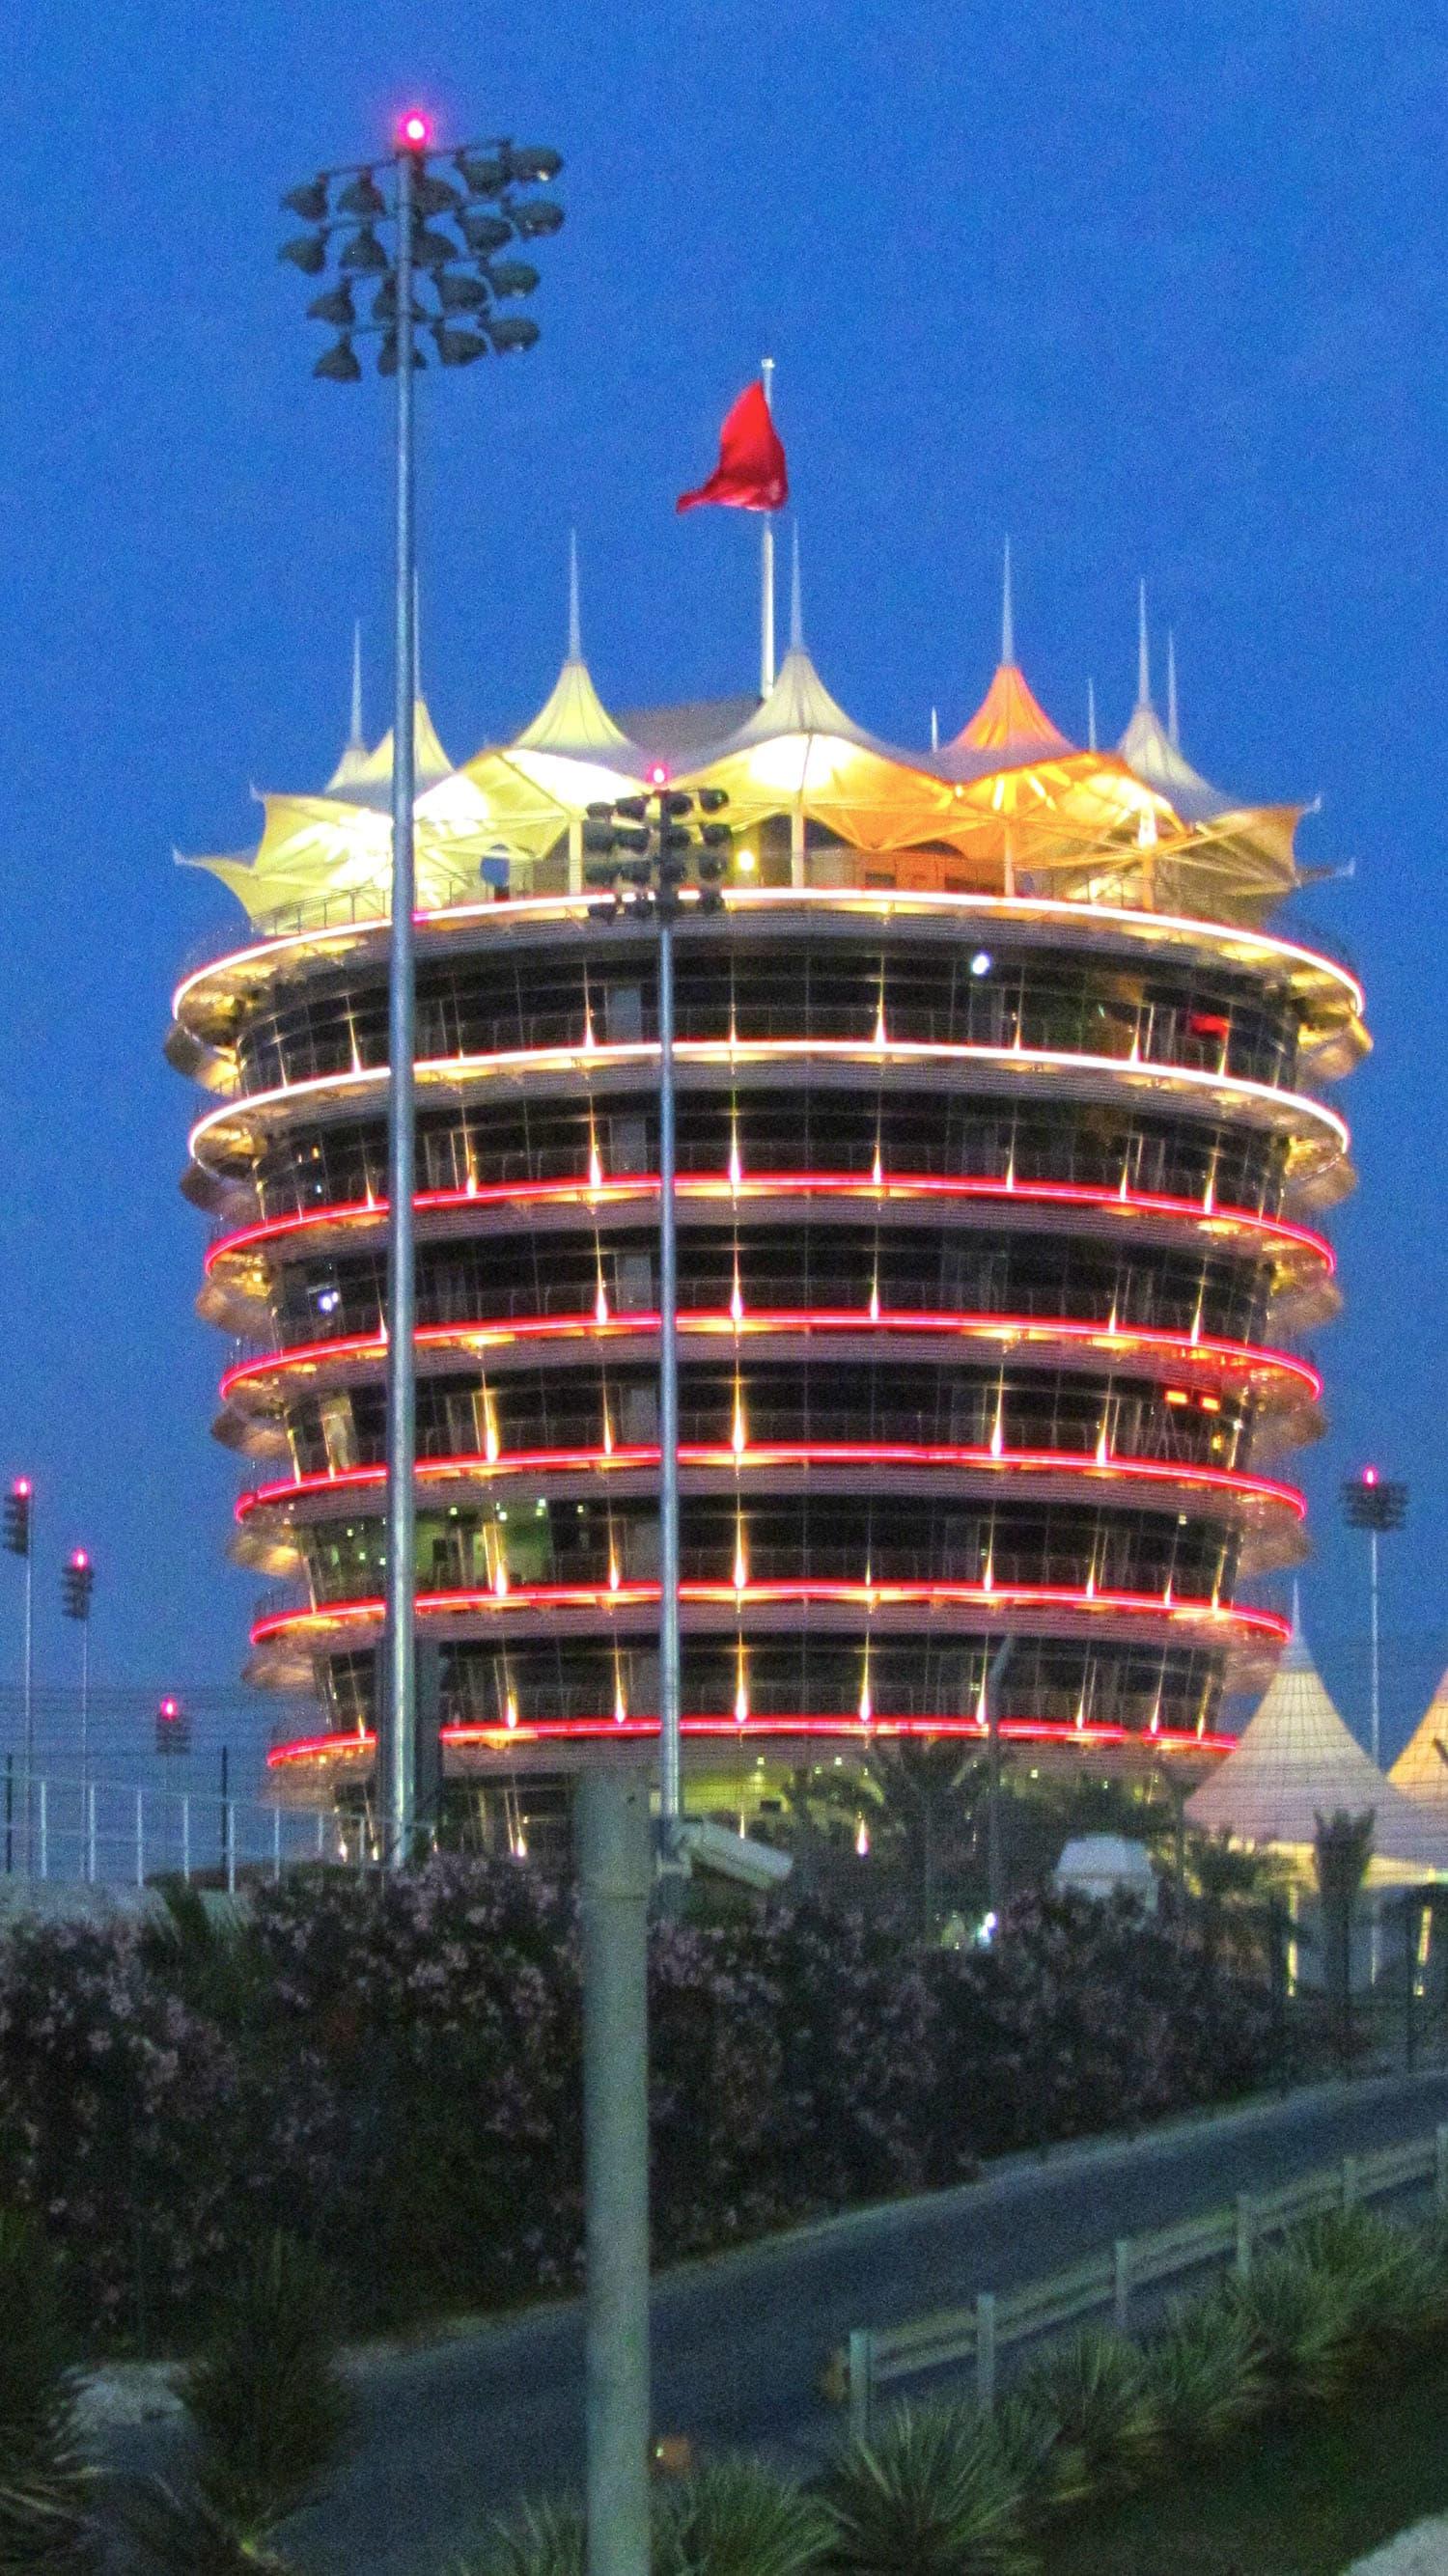 The iconic Sakhir Tower at the Bahrain Grand Prix circuit.